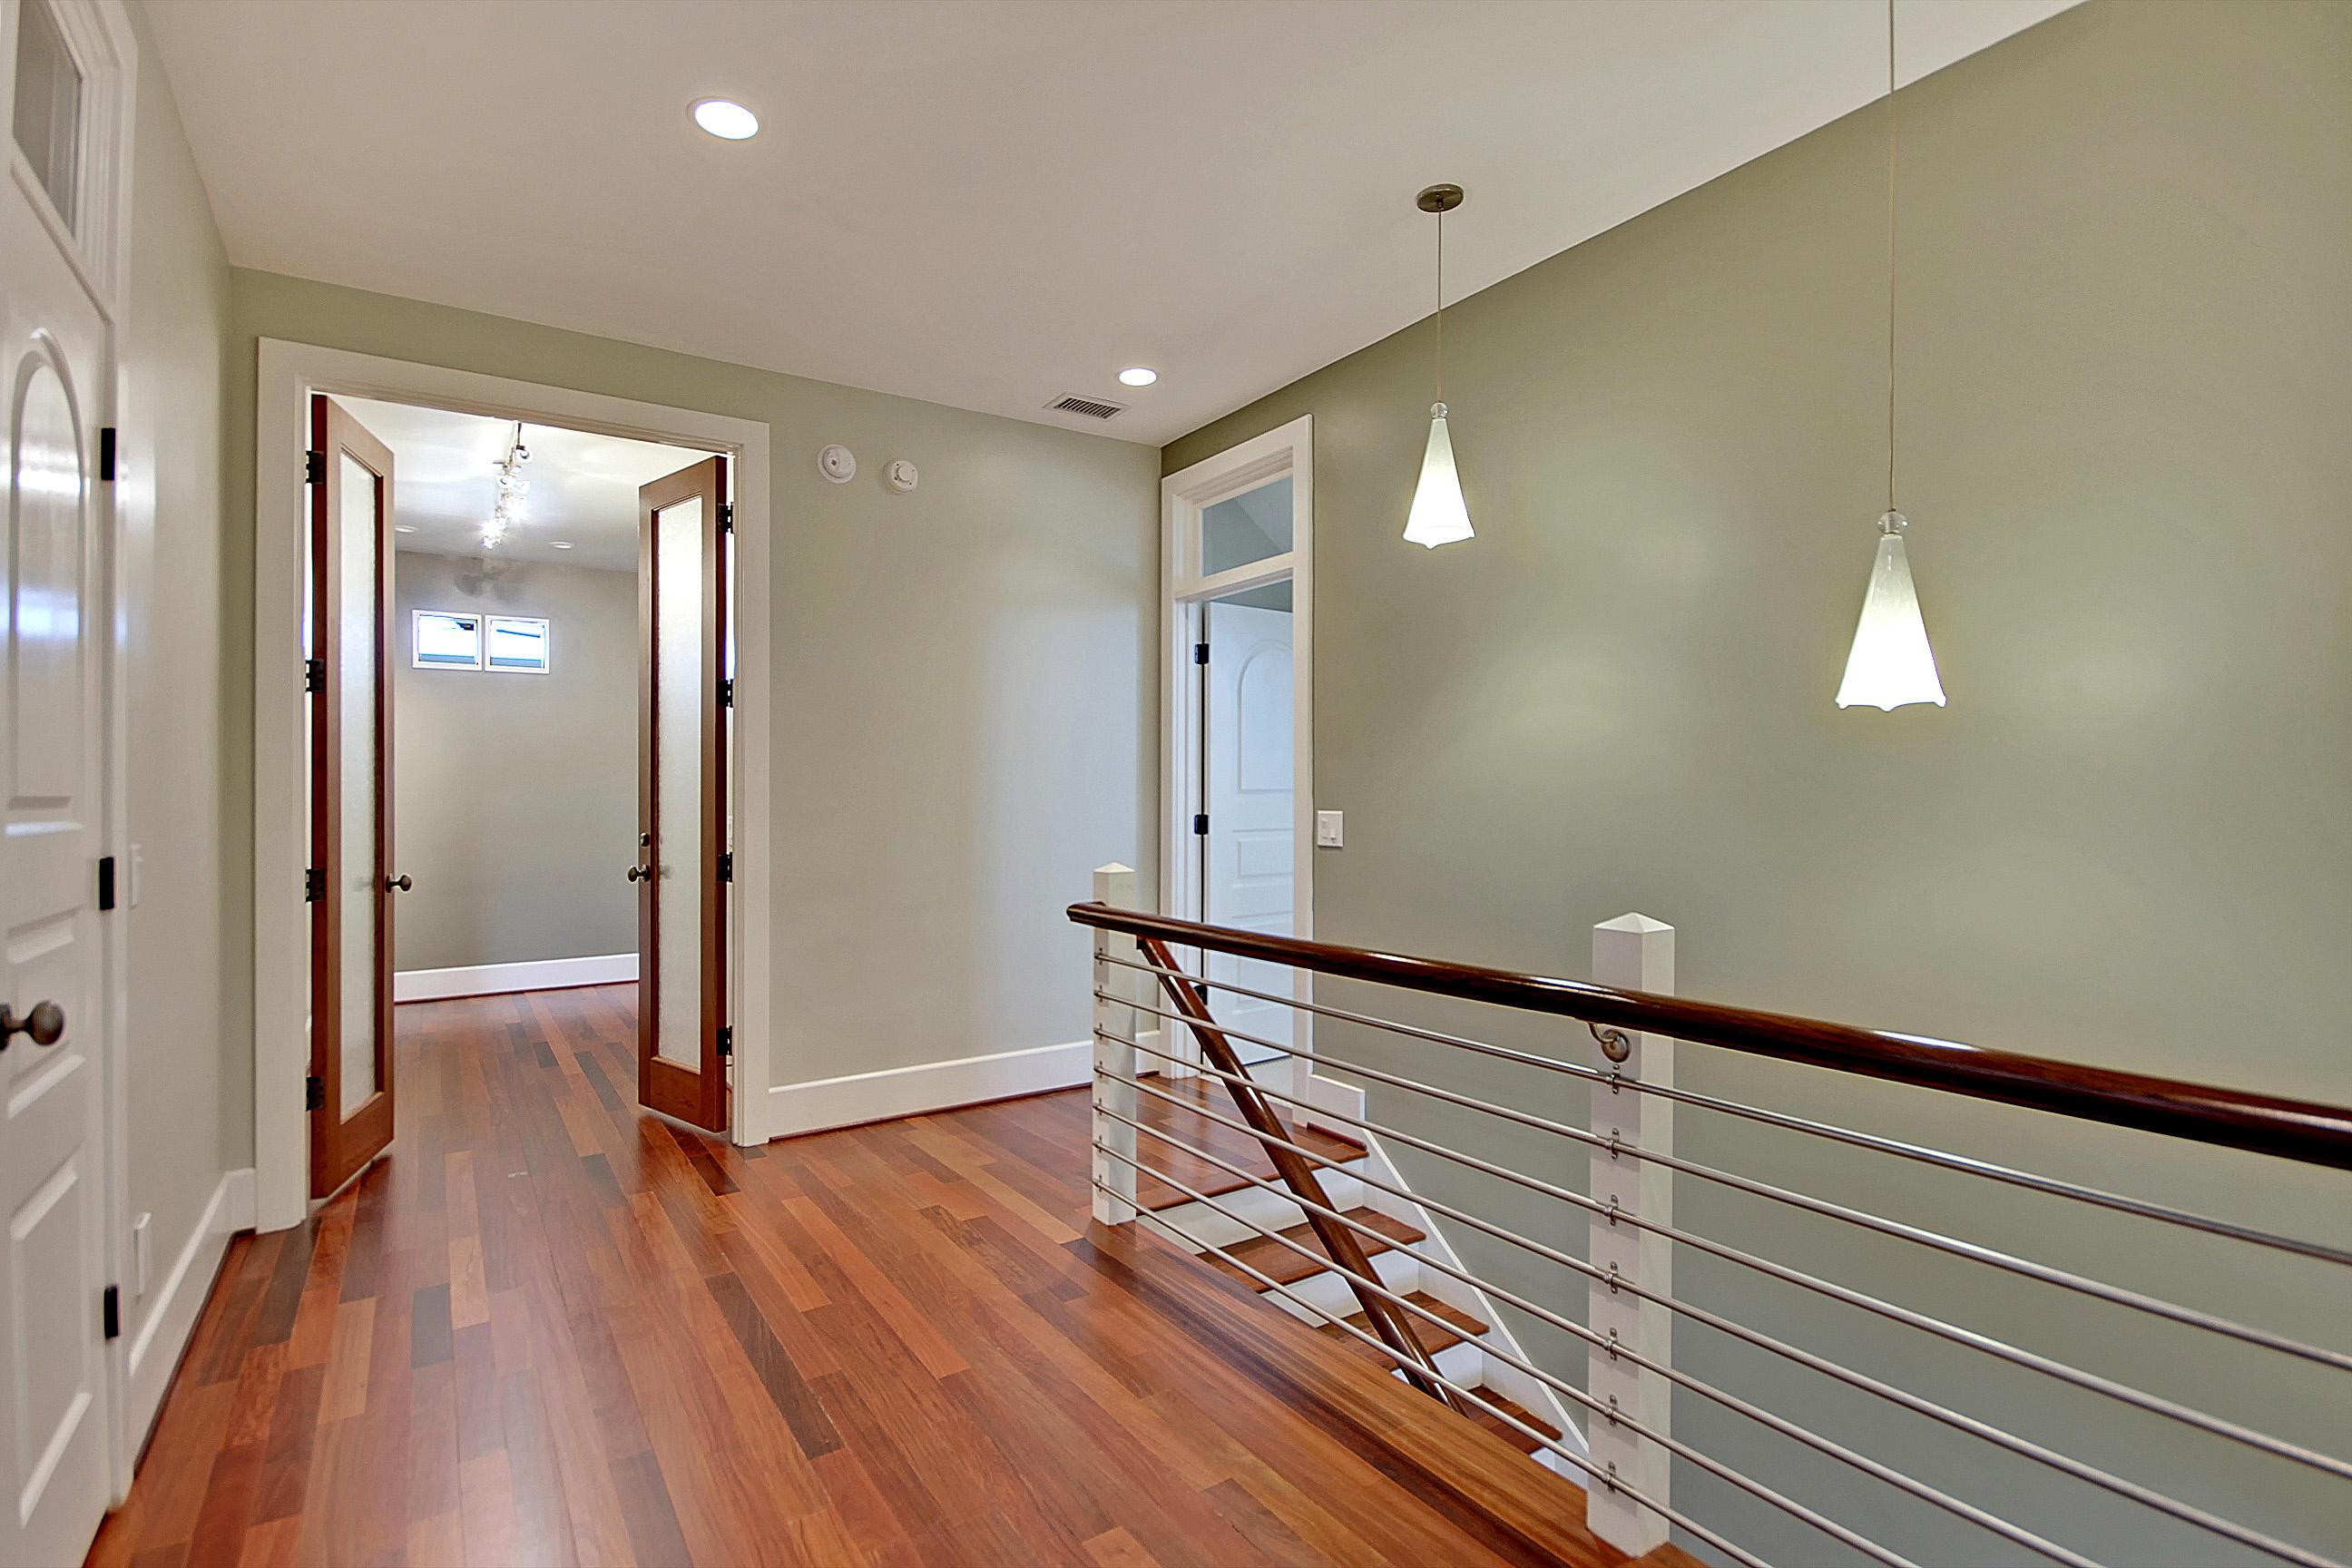 Beresford Creek Landing Homes For Sale - 1053 Rivershore, Charleston, SC - 49